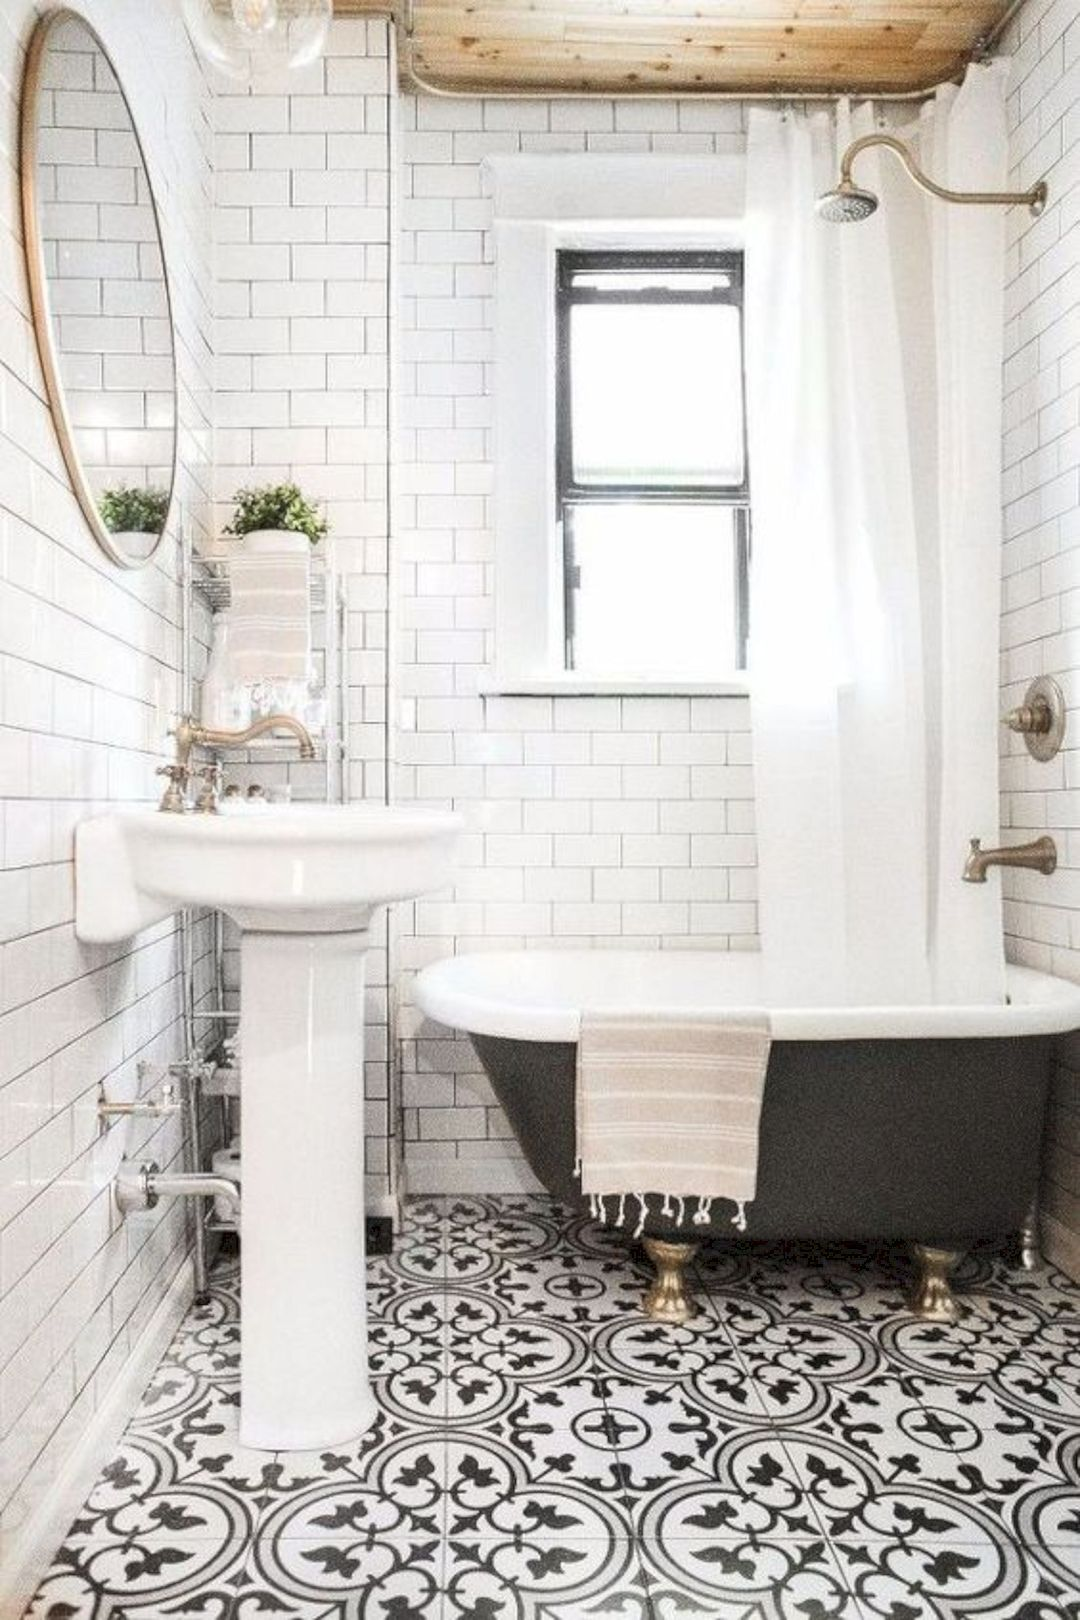 16 Small Bathroom Renovation Ideas | Small bathroom renovations ...